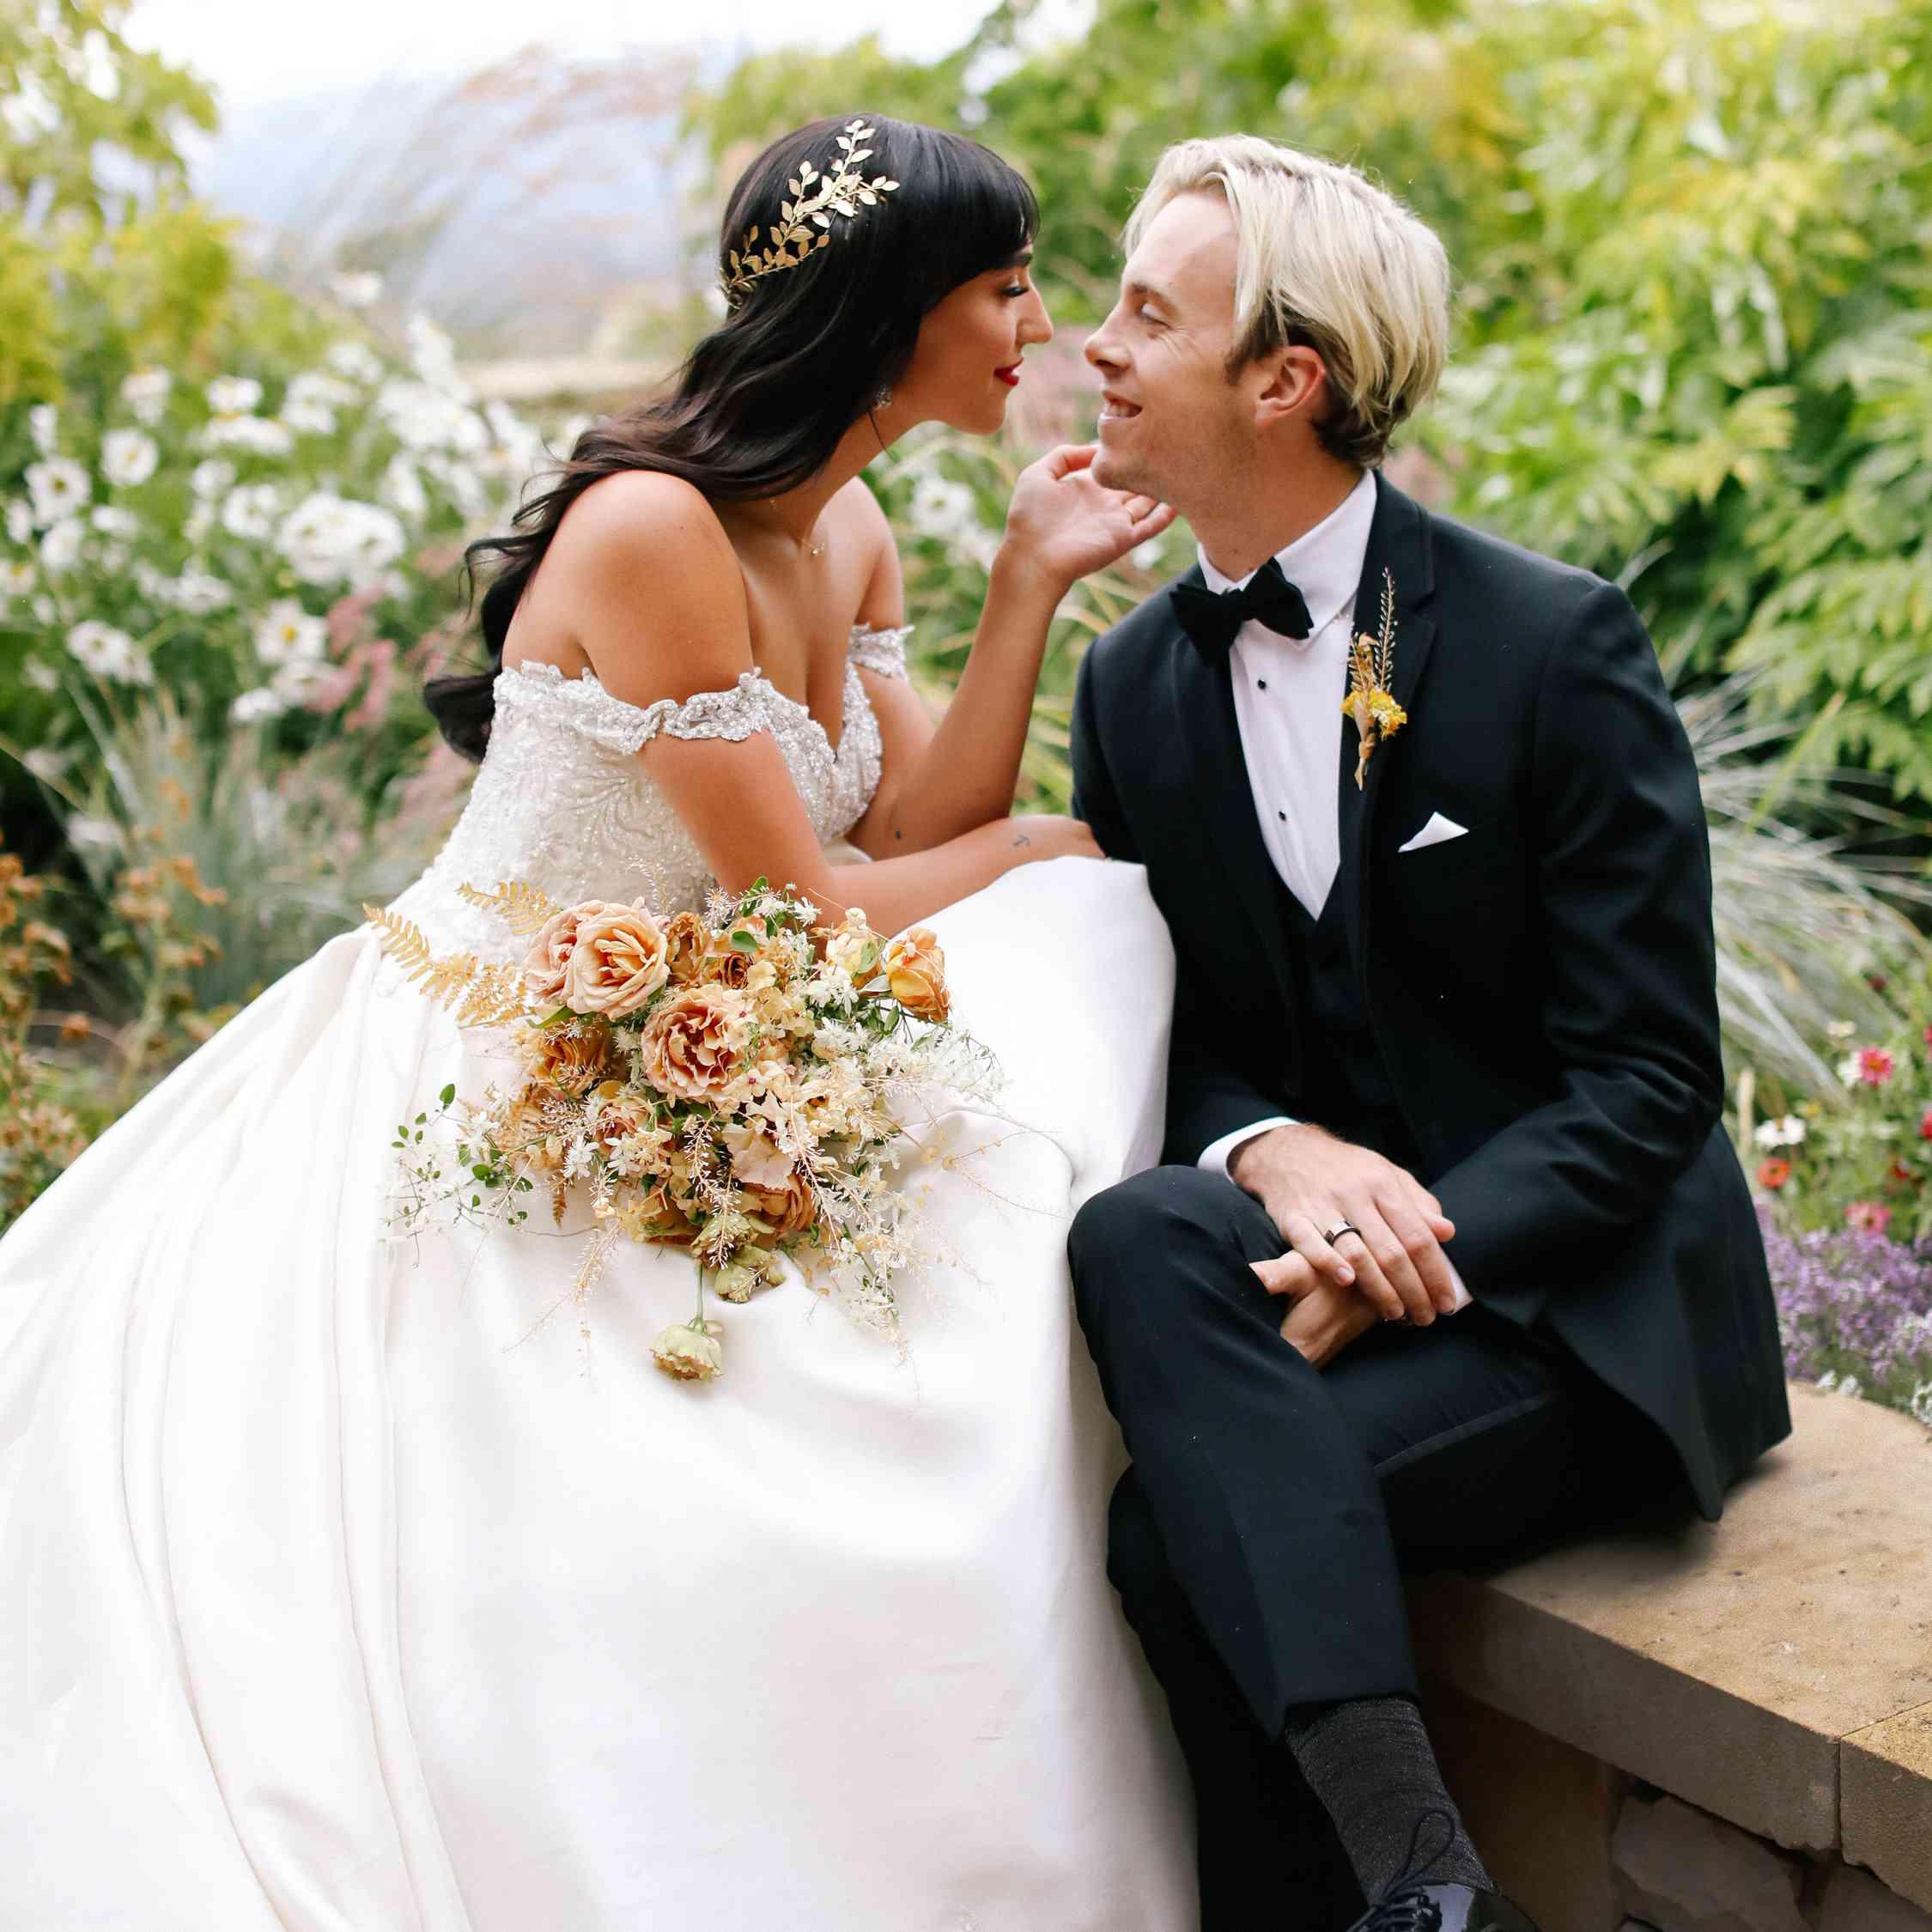 savannah and riker wedding, couple